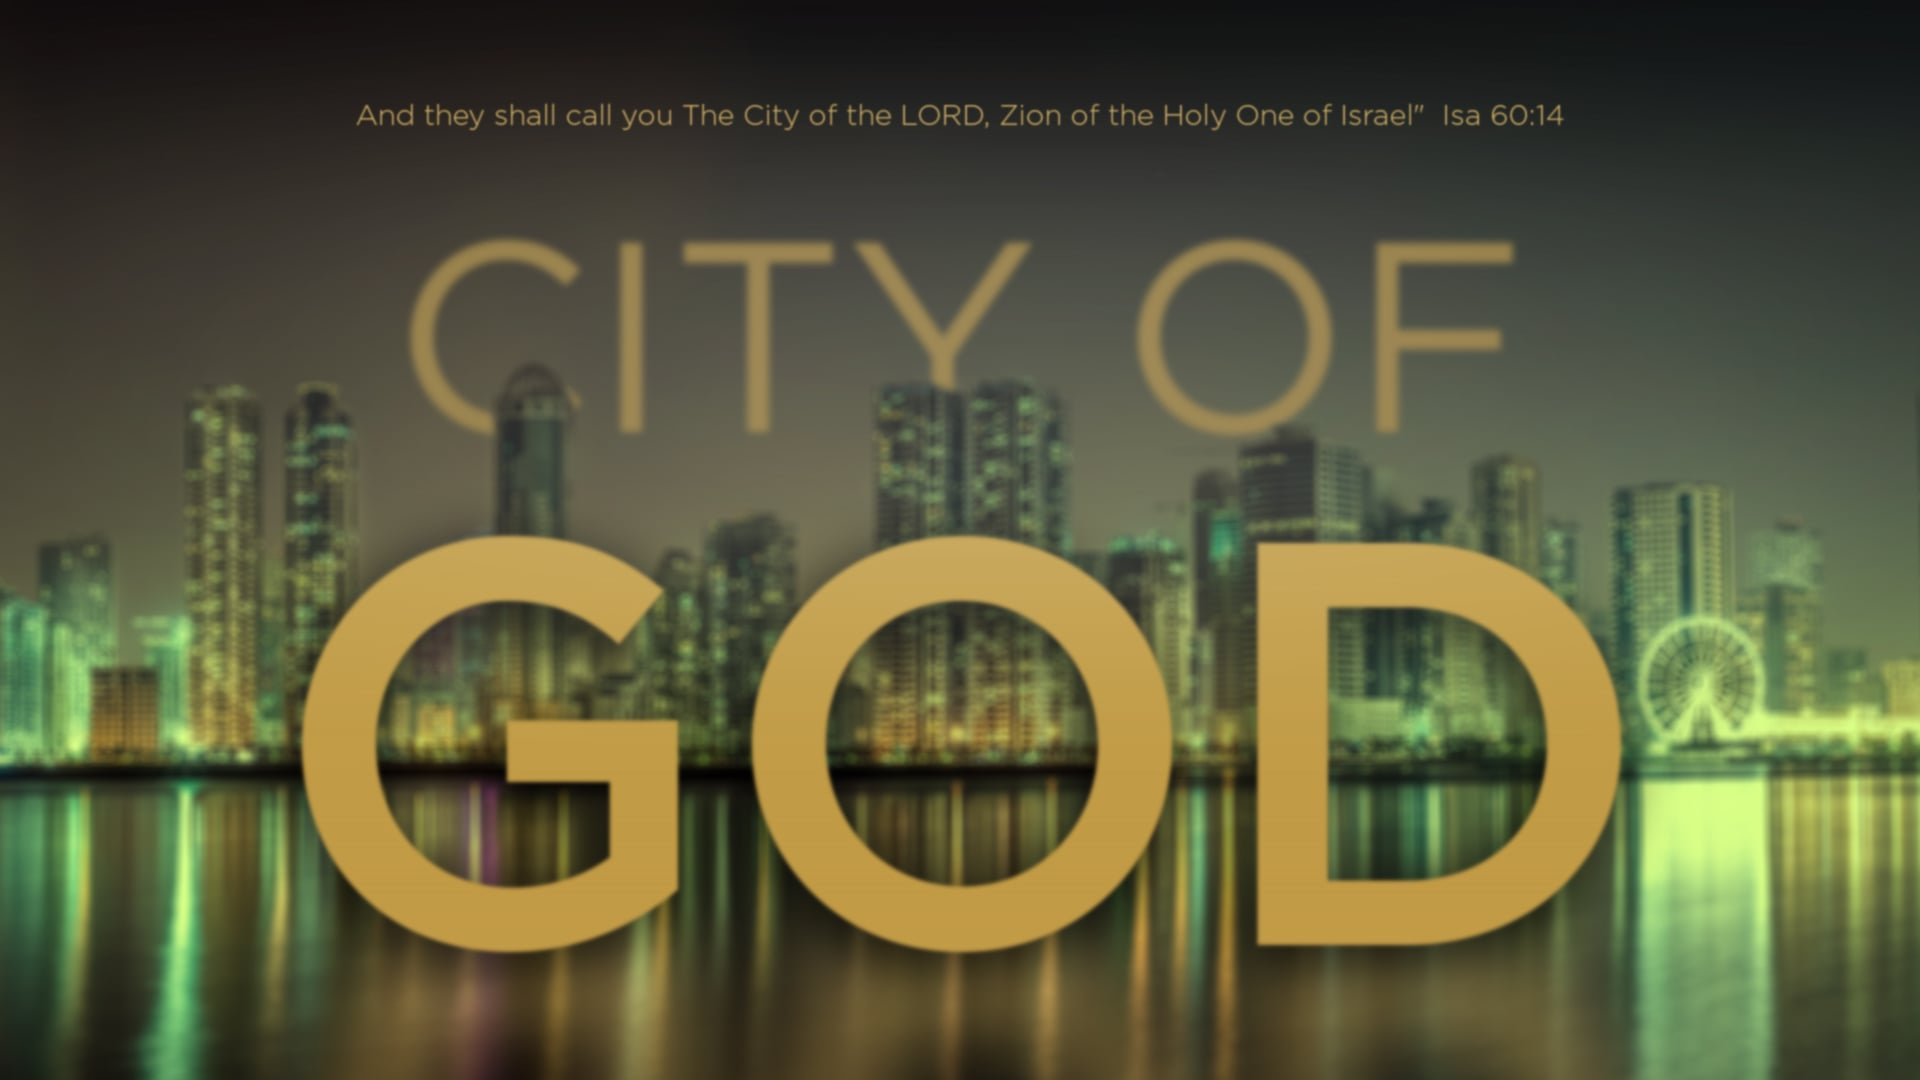 City of God - Part 6